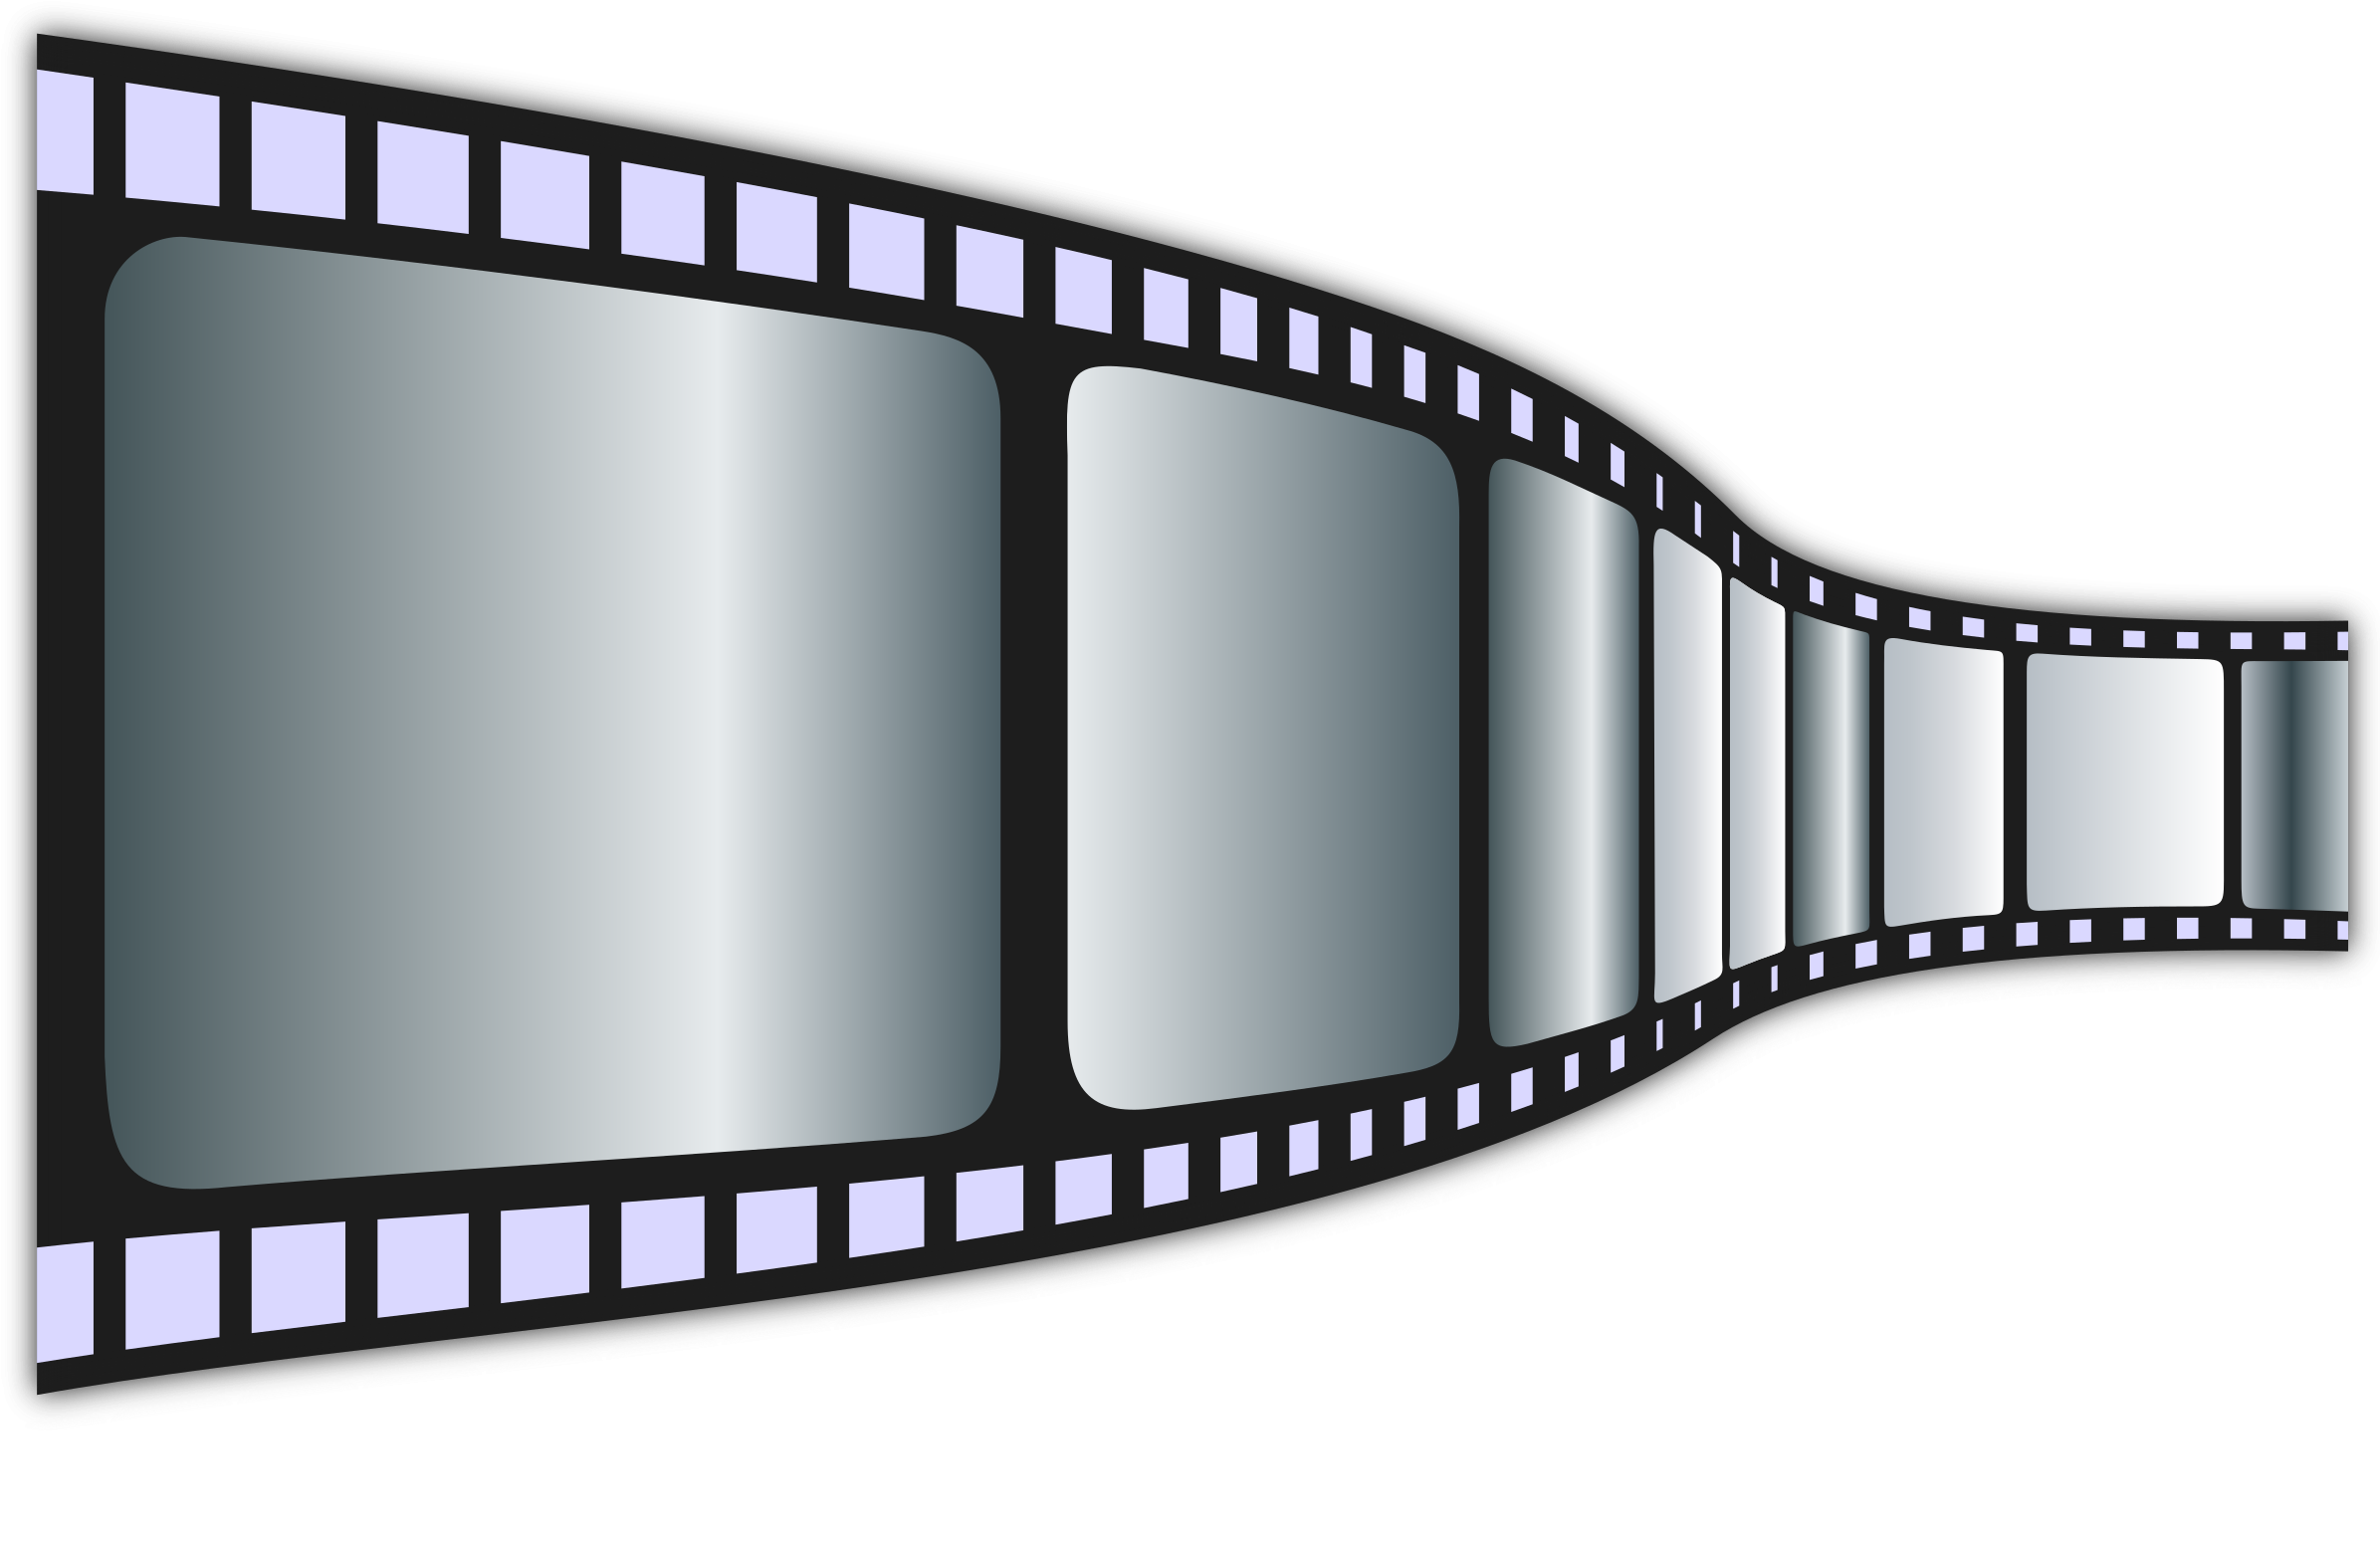 Film Strip Free To Use Clip Art - Quiz Film Round - Png ...